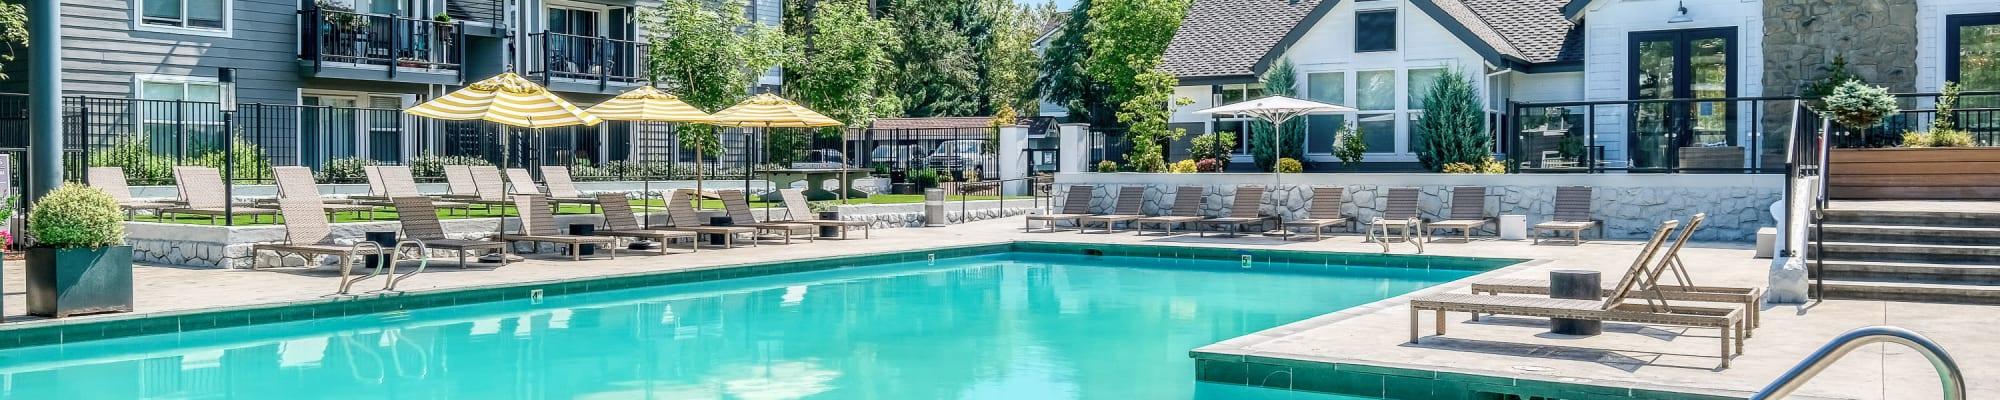 Photo gallery at Centro Apartment Homes in Hillsboro, Oregon